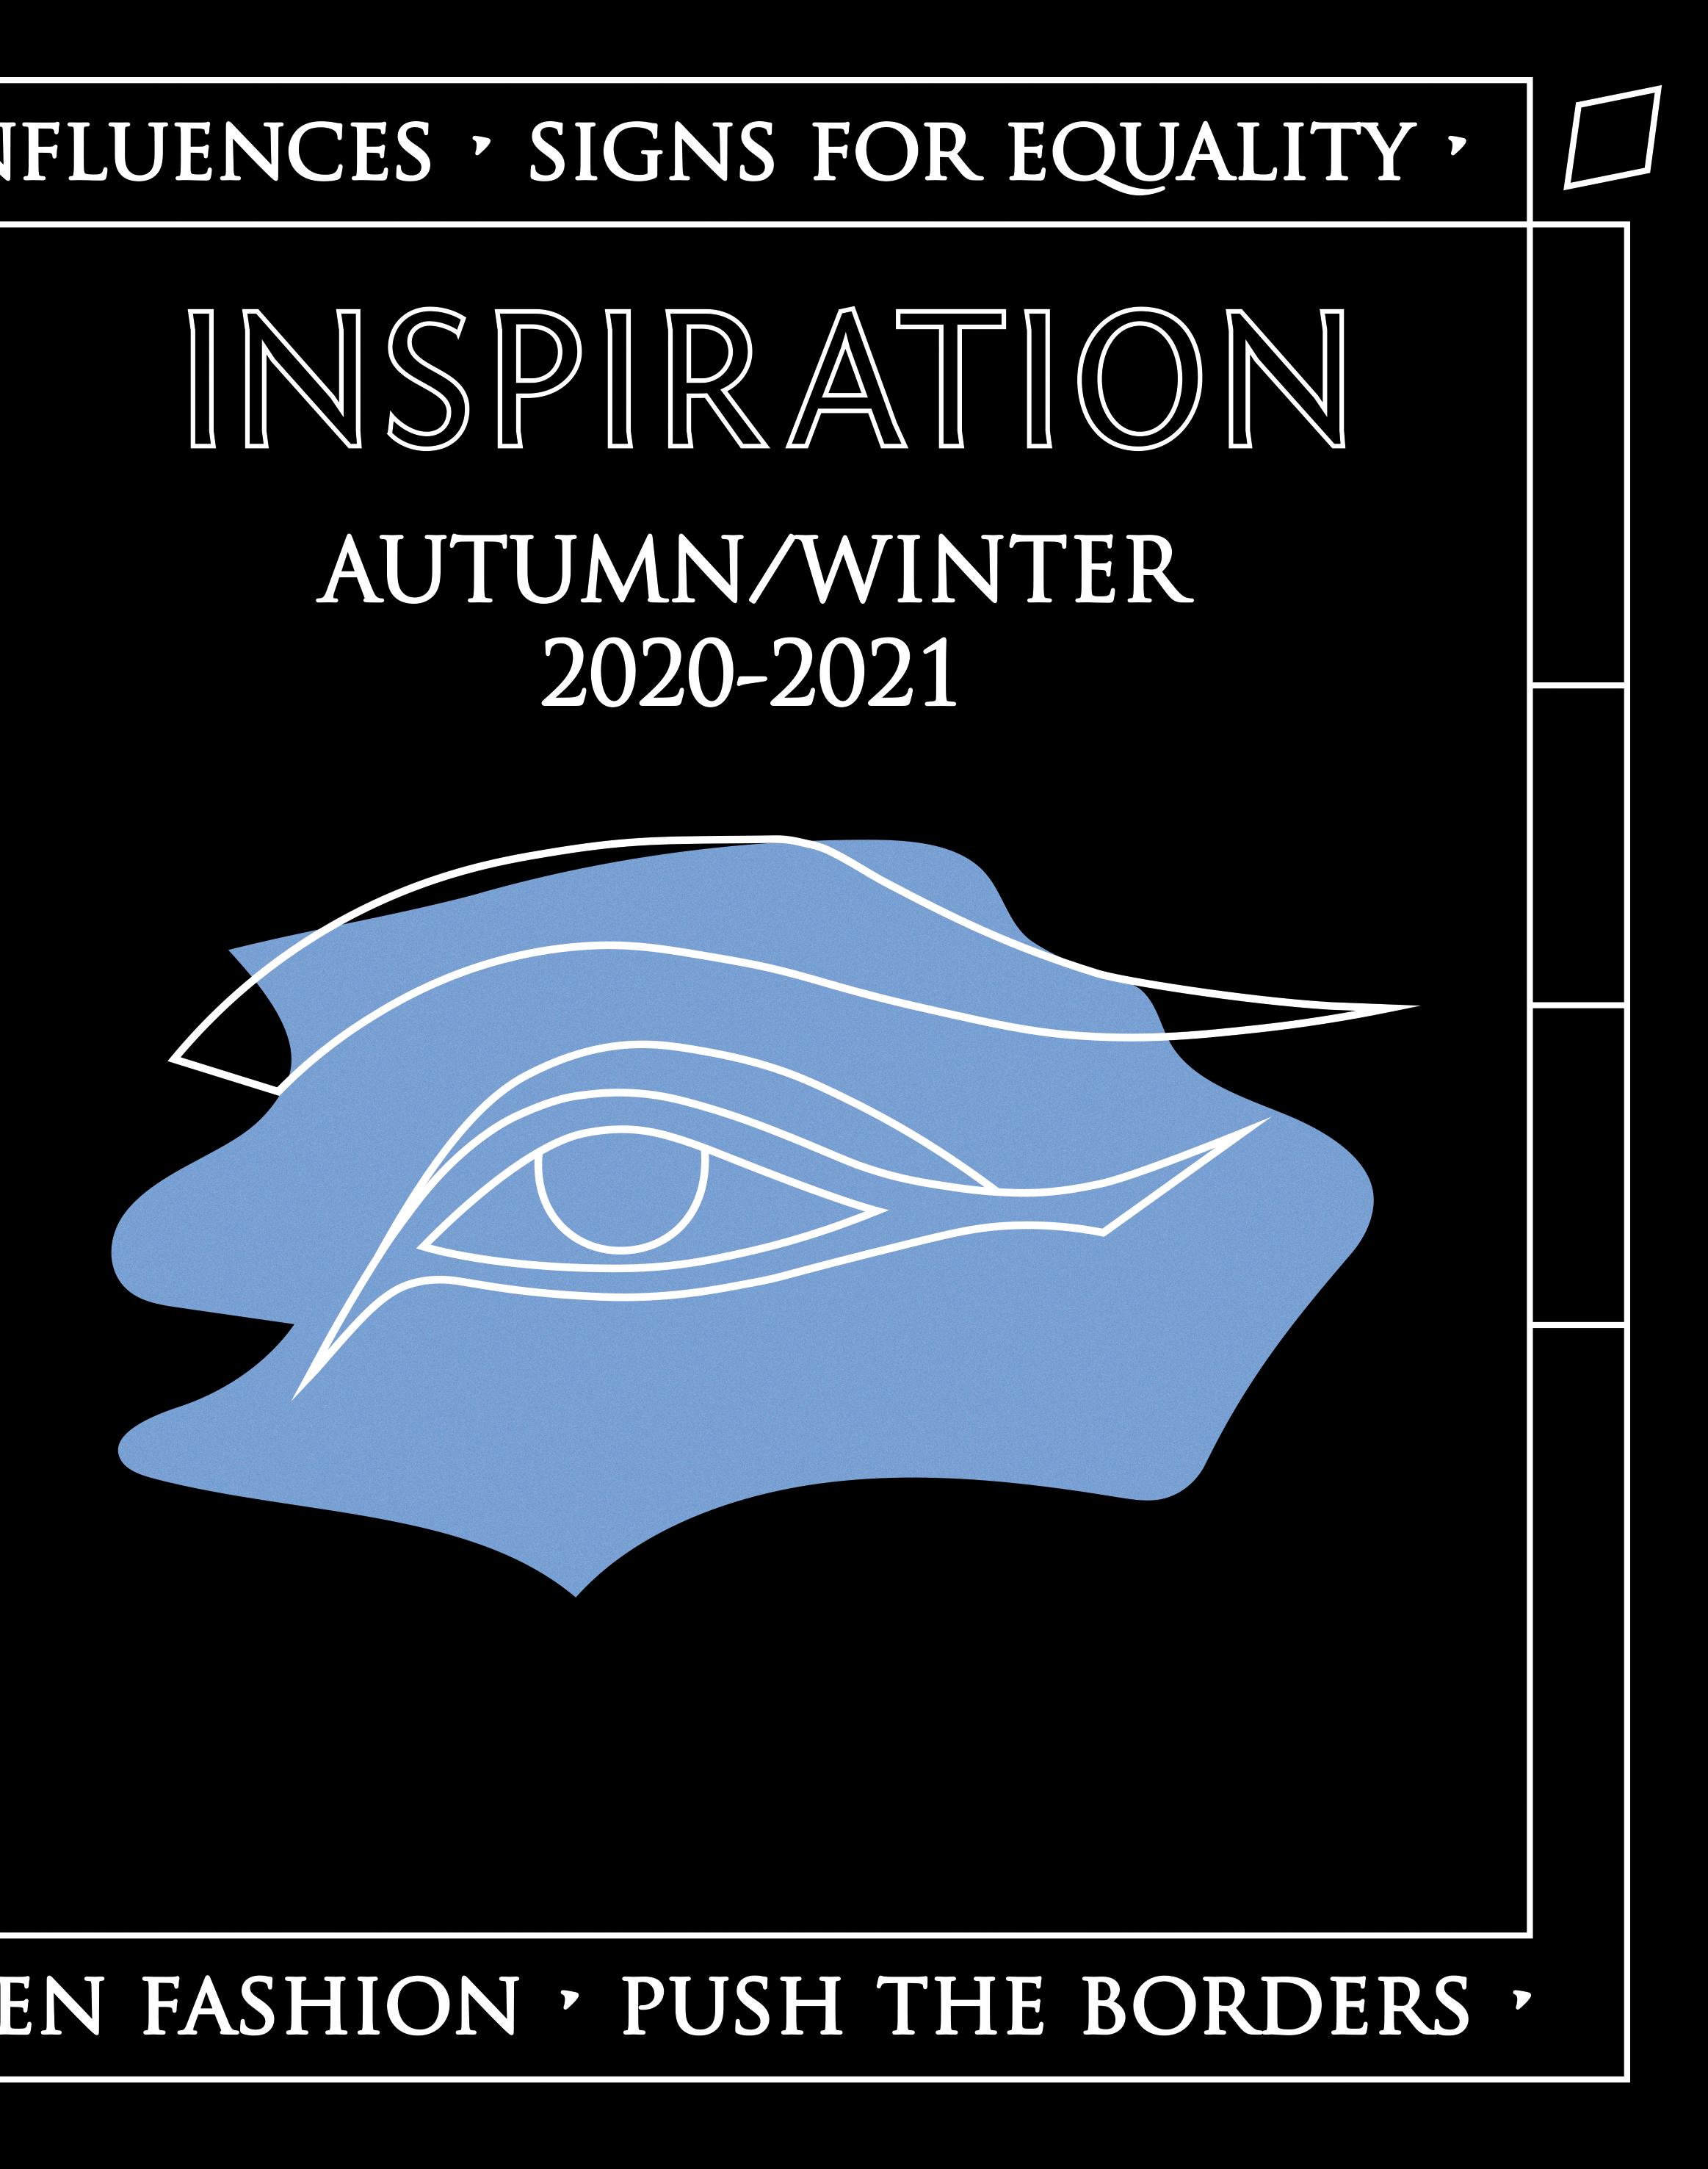 OMSLAG_INSPIRATION_AW20-21_rgb.jpg